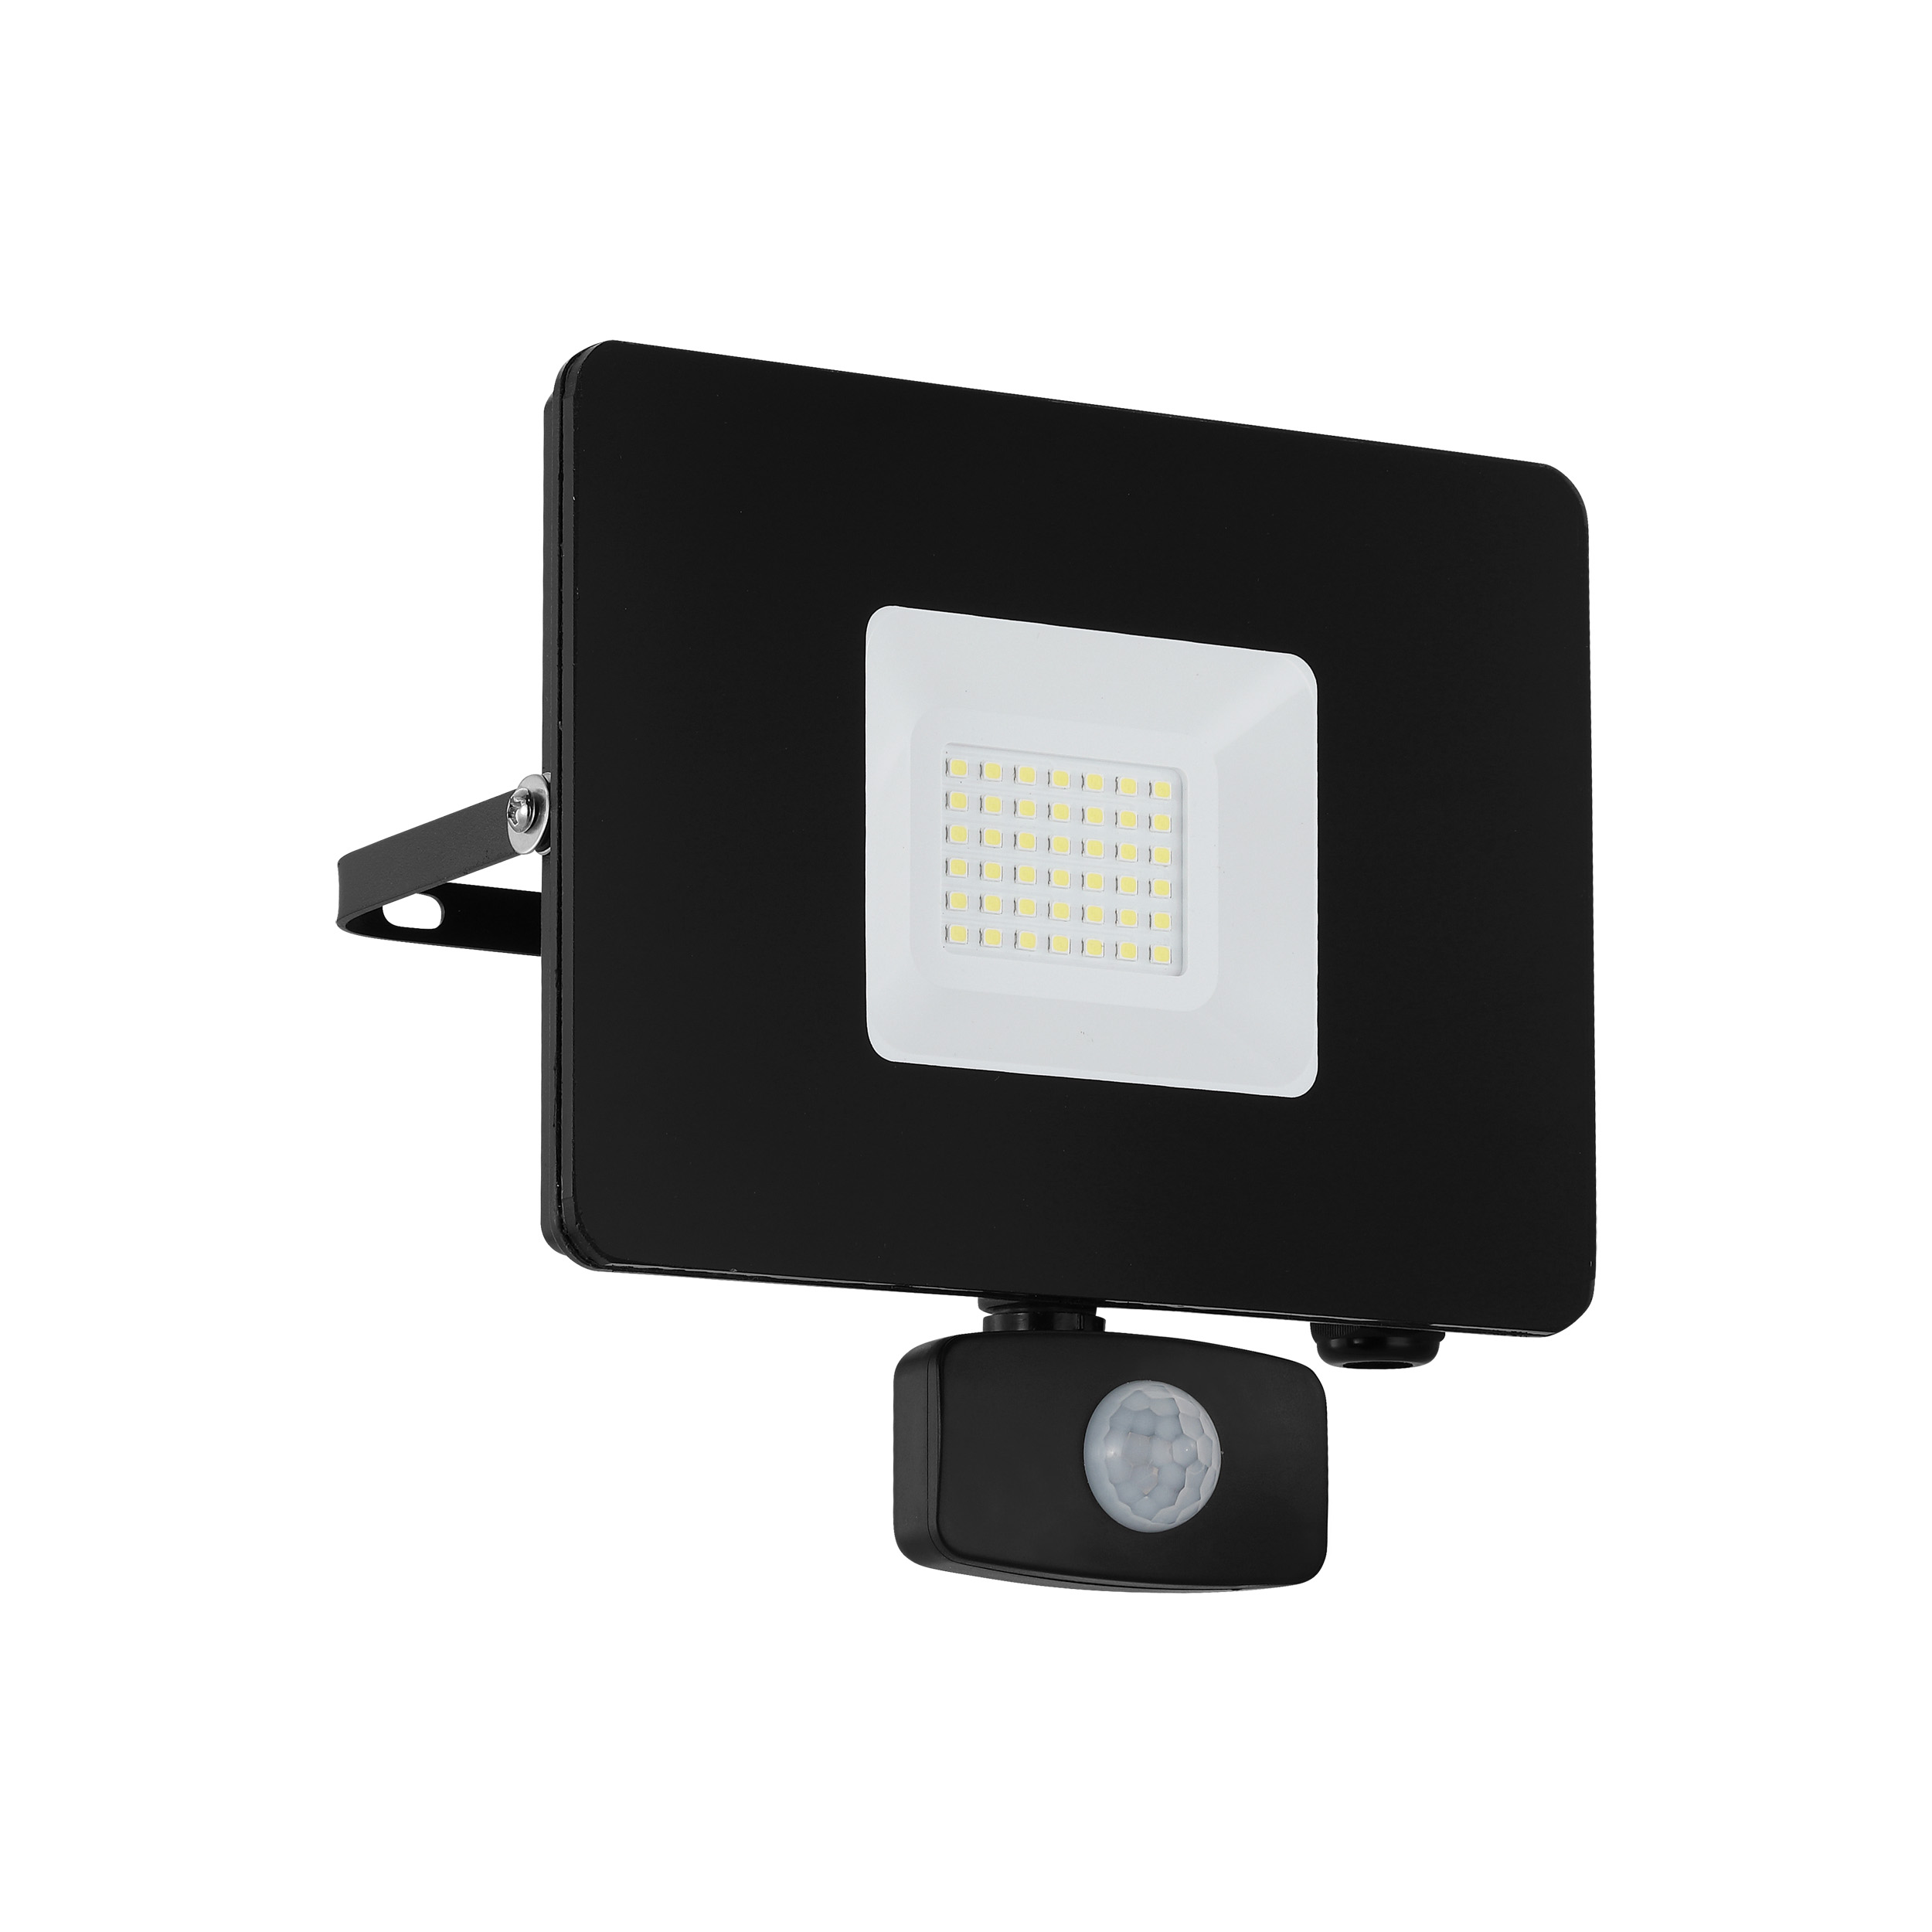 Led buiten wandlamp faedo 3 met sensor 30W zwart